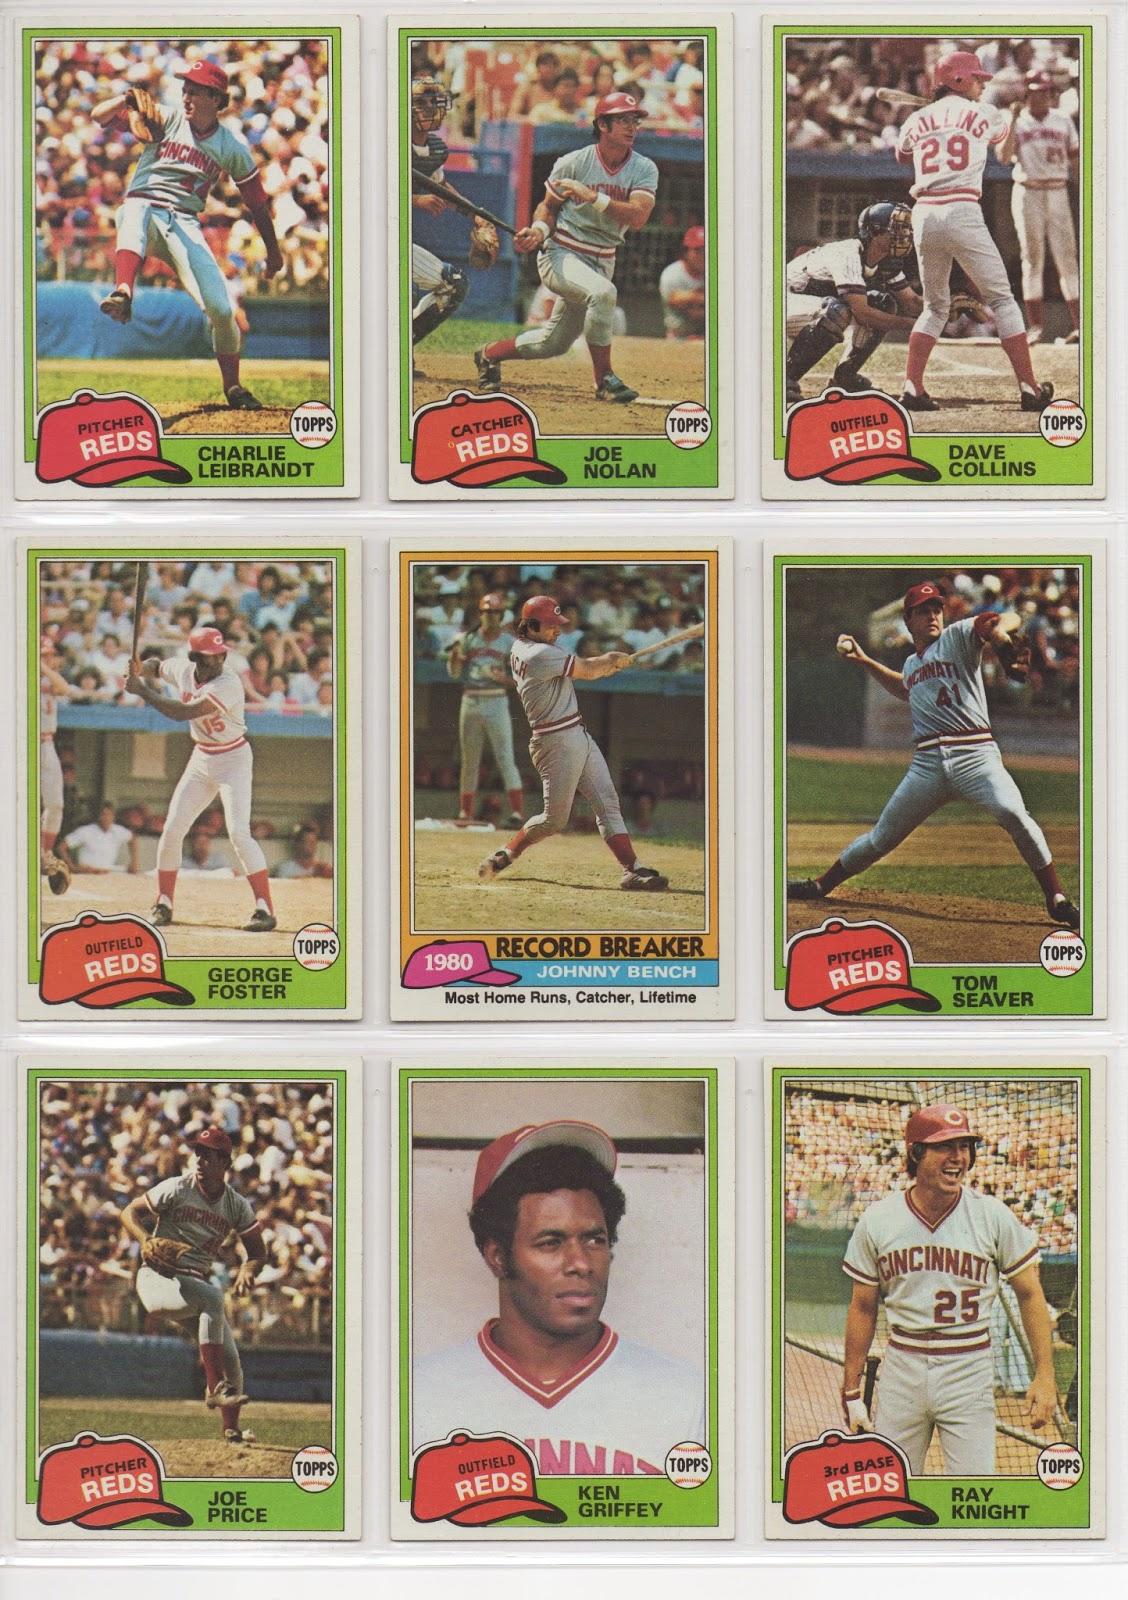 600 Johnny Bench 606 Cincinnati Reds Rookies 628 Vic Correll 655 Dan  Driessen 677 Cincinnati Reds Team Card 712 Bill Bonham 736 Larry Biittner